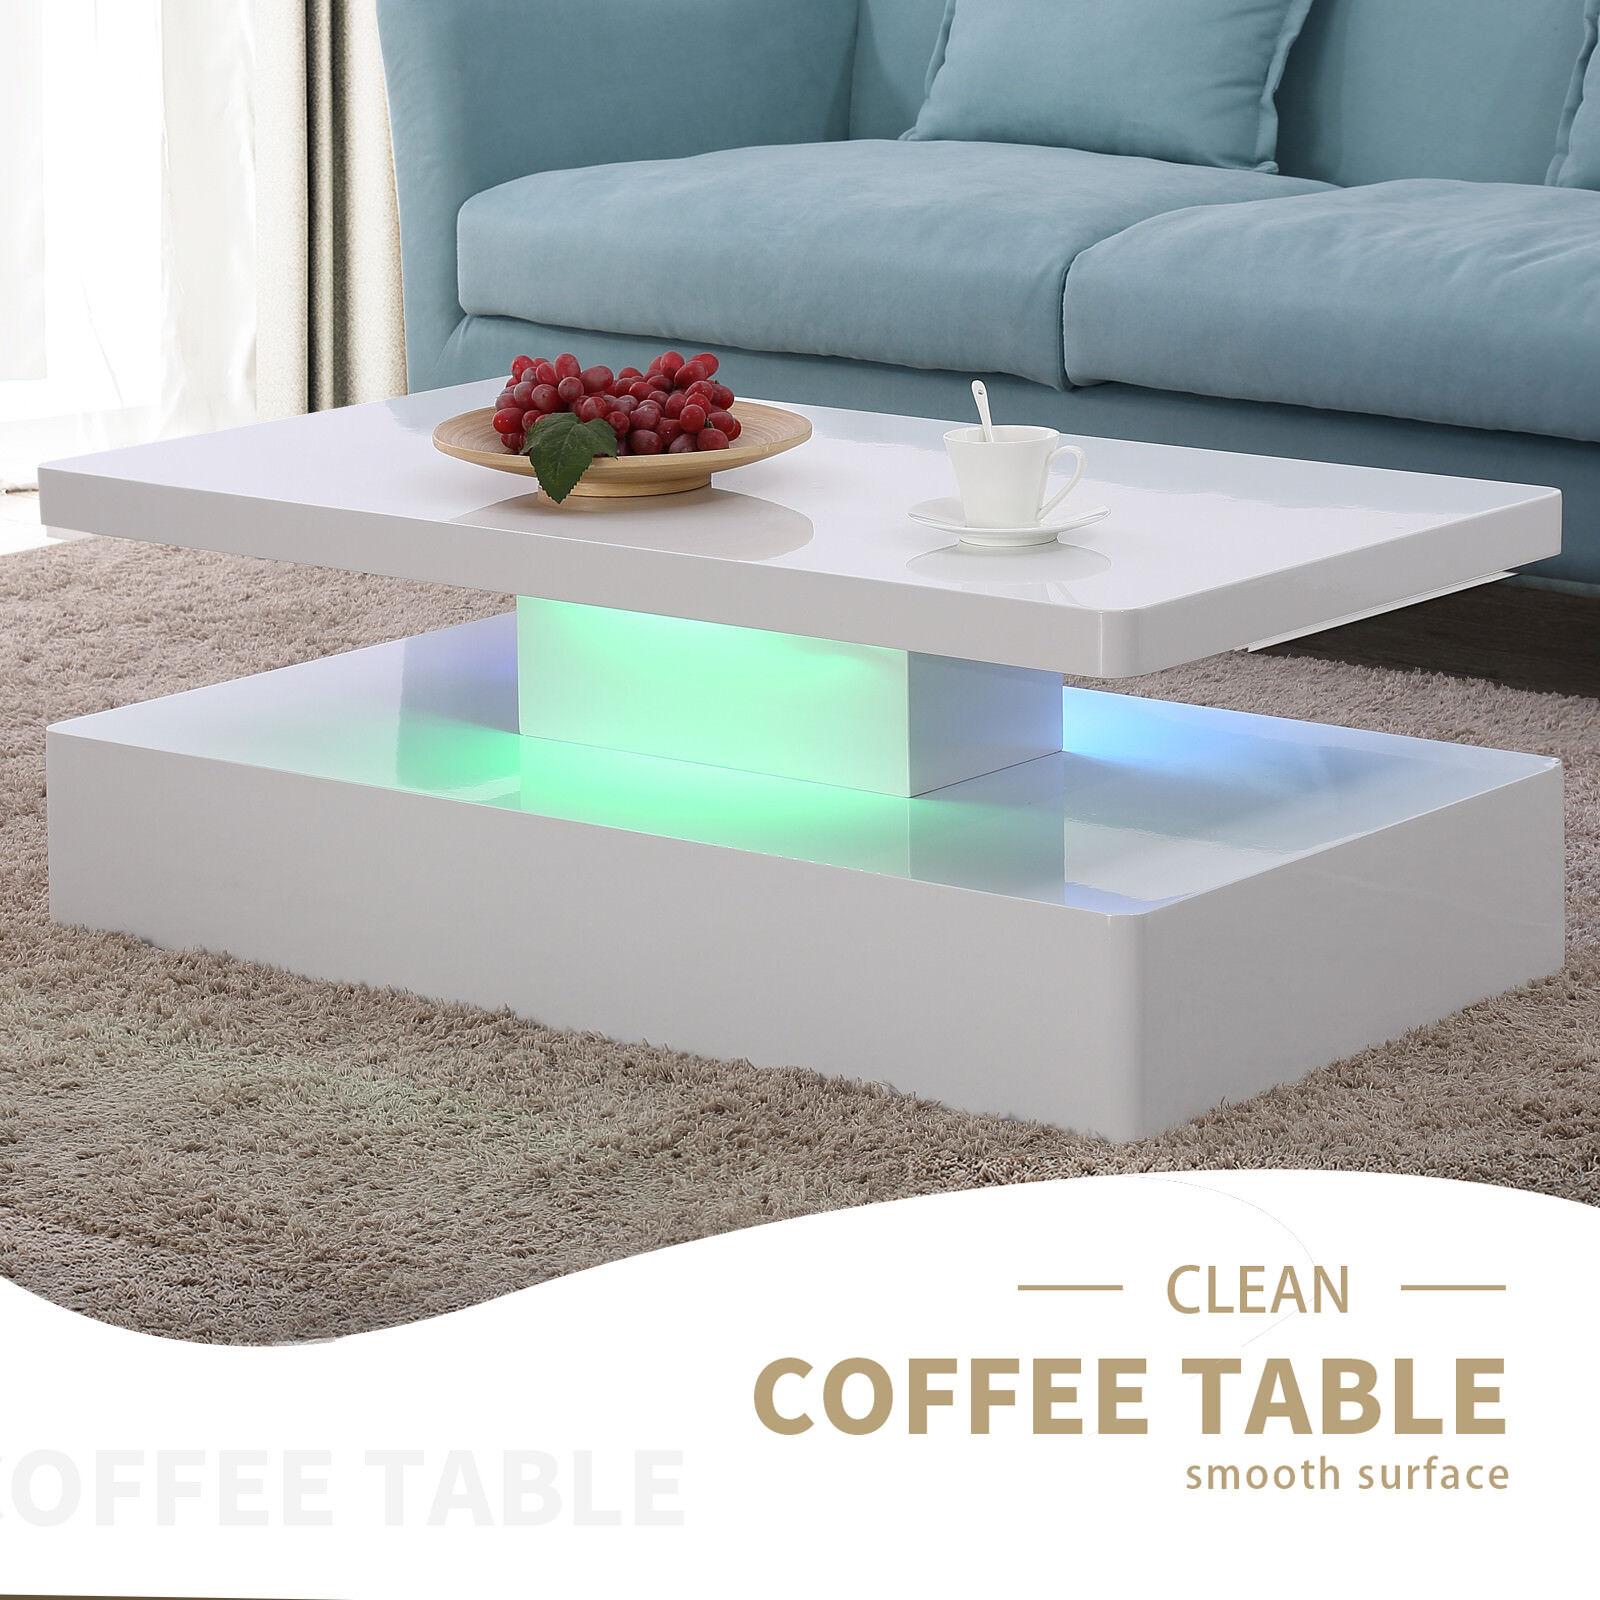 Dakavia High Gloss Led Lighting Coffee Table In White Living Room Furniture